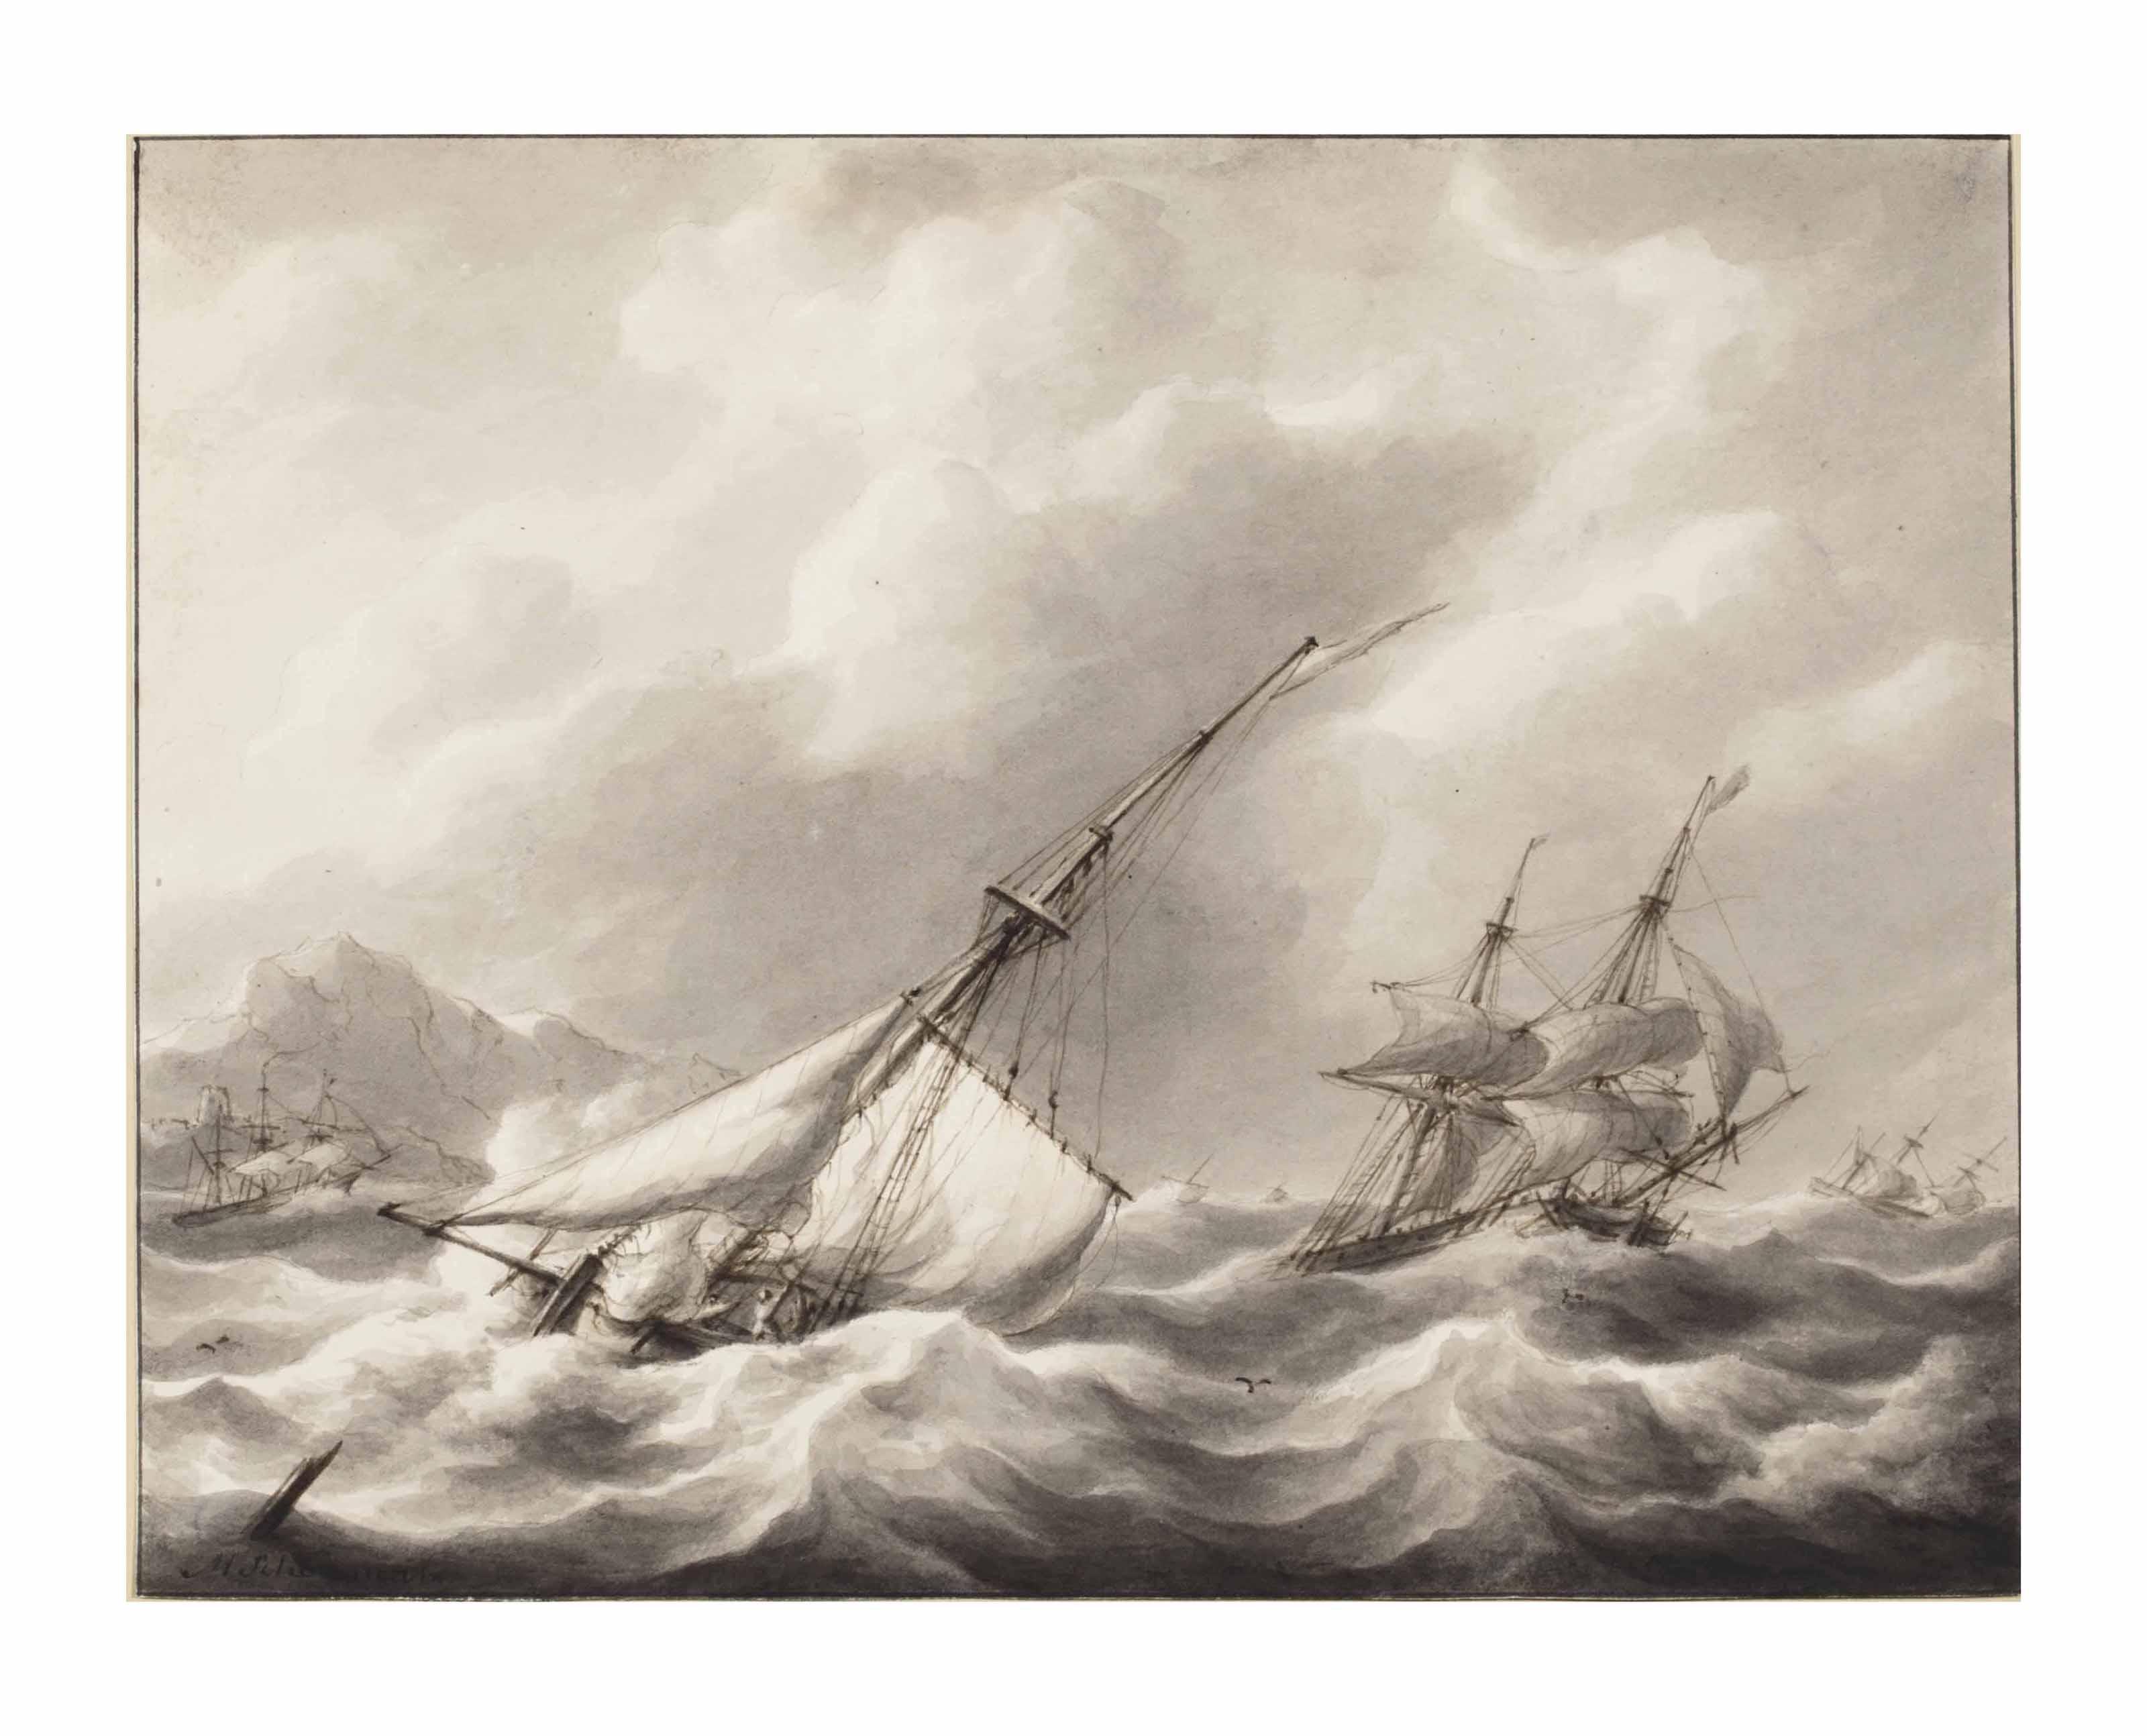 Shipping in rough seas